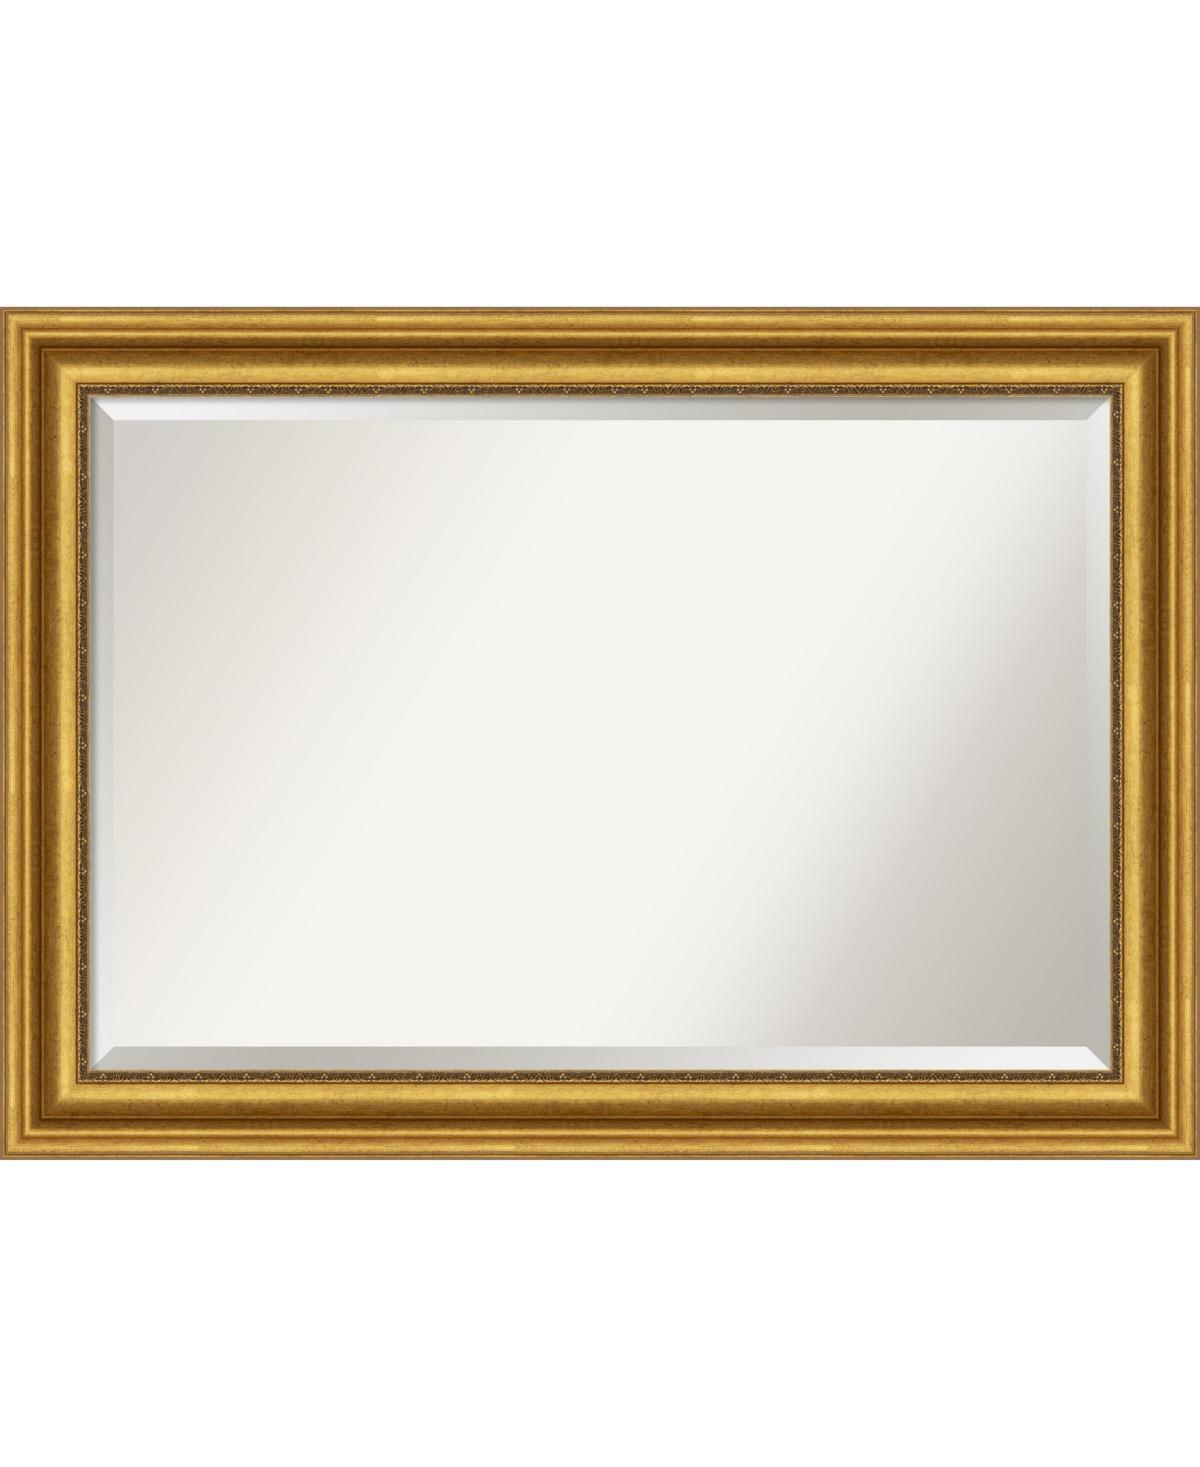 Amanti Art Parlor Gold-tone Framed Bathroom Vanity Wall Mirror, 41.62